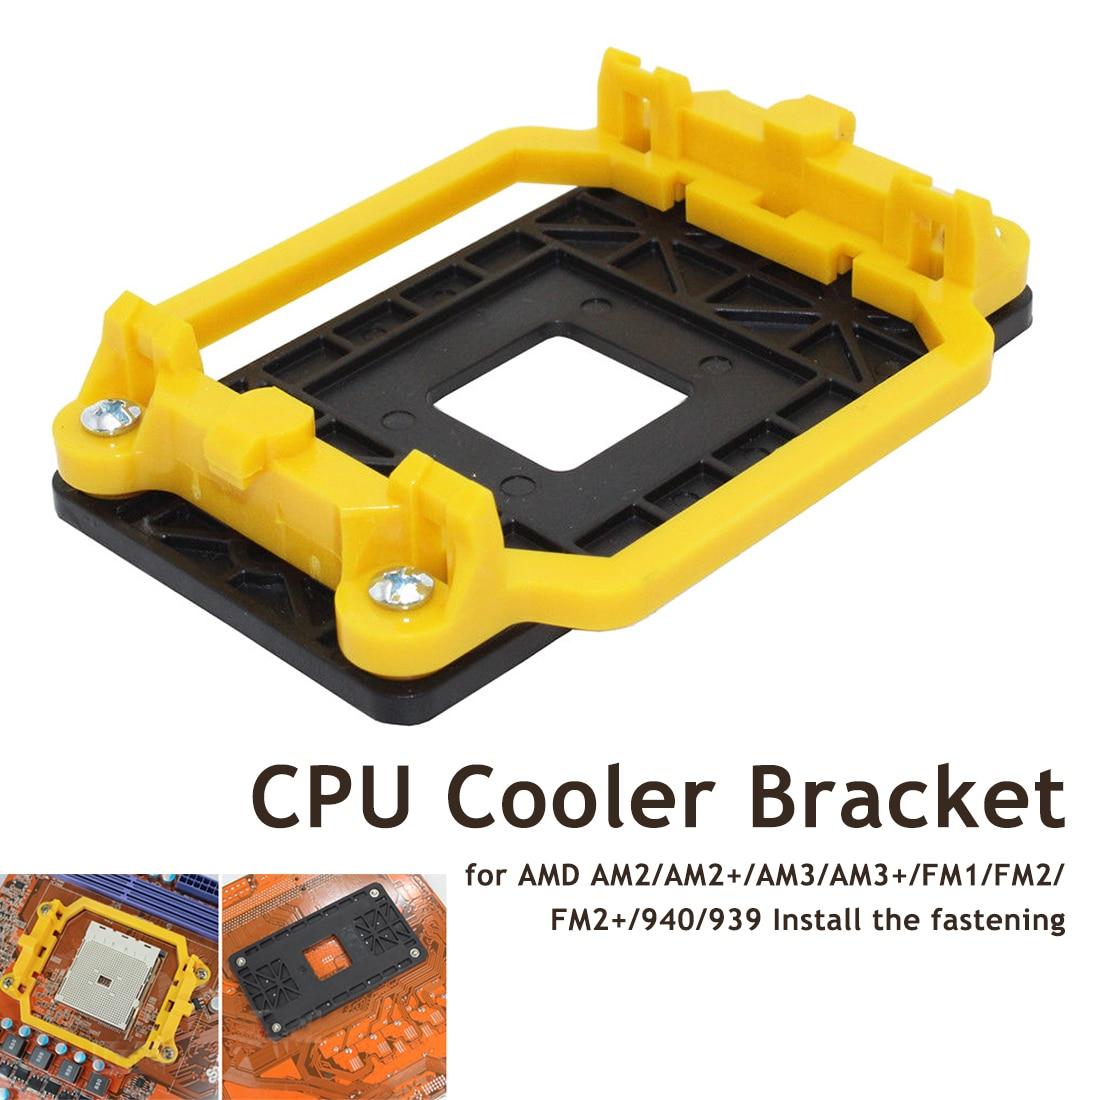 Etmakit Quality CPU Cooler Bracket Motherboard For AMD AM2/AM2+/AM3/AM3+/FM1/FM2/FM2+/940/939 Install The Fastening